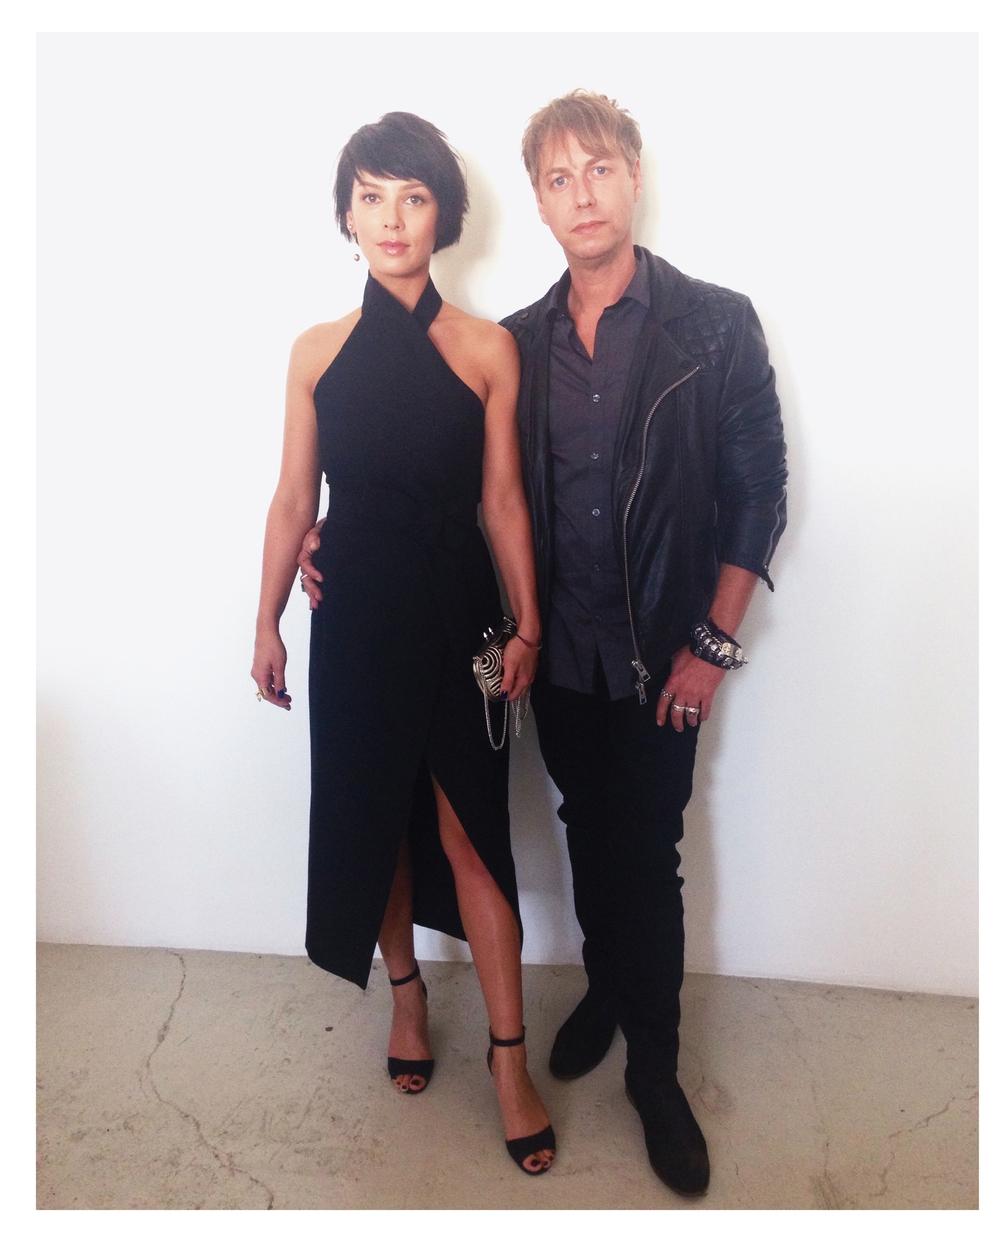 Jake Gosling & Nuuxs/ Grammy Awards